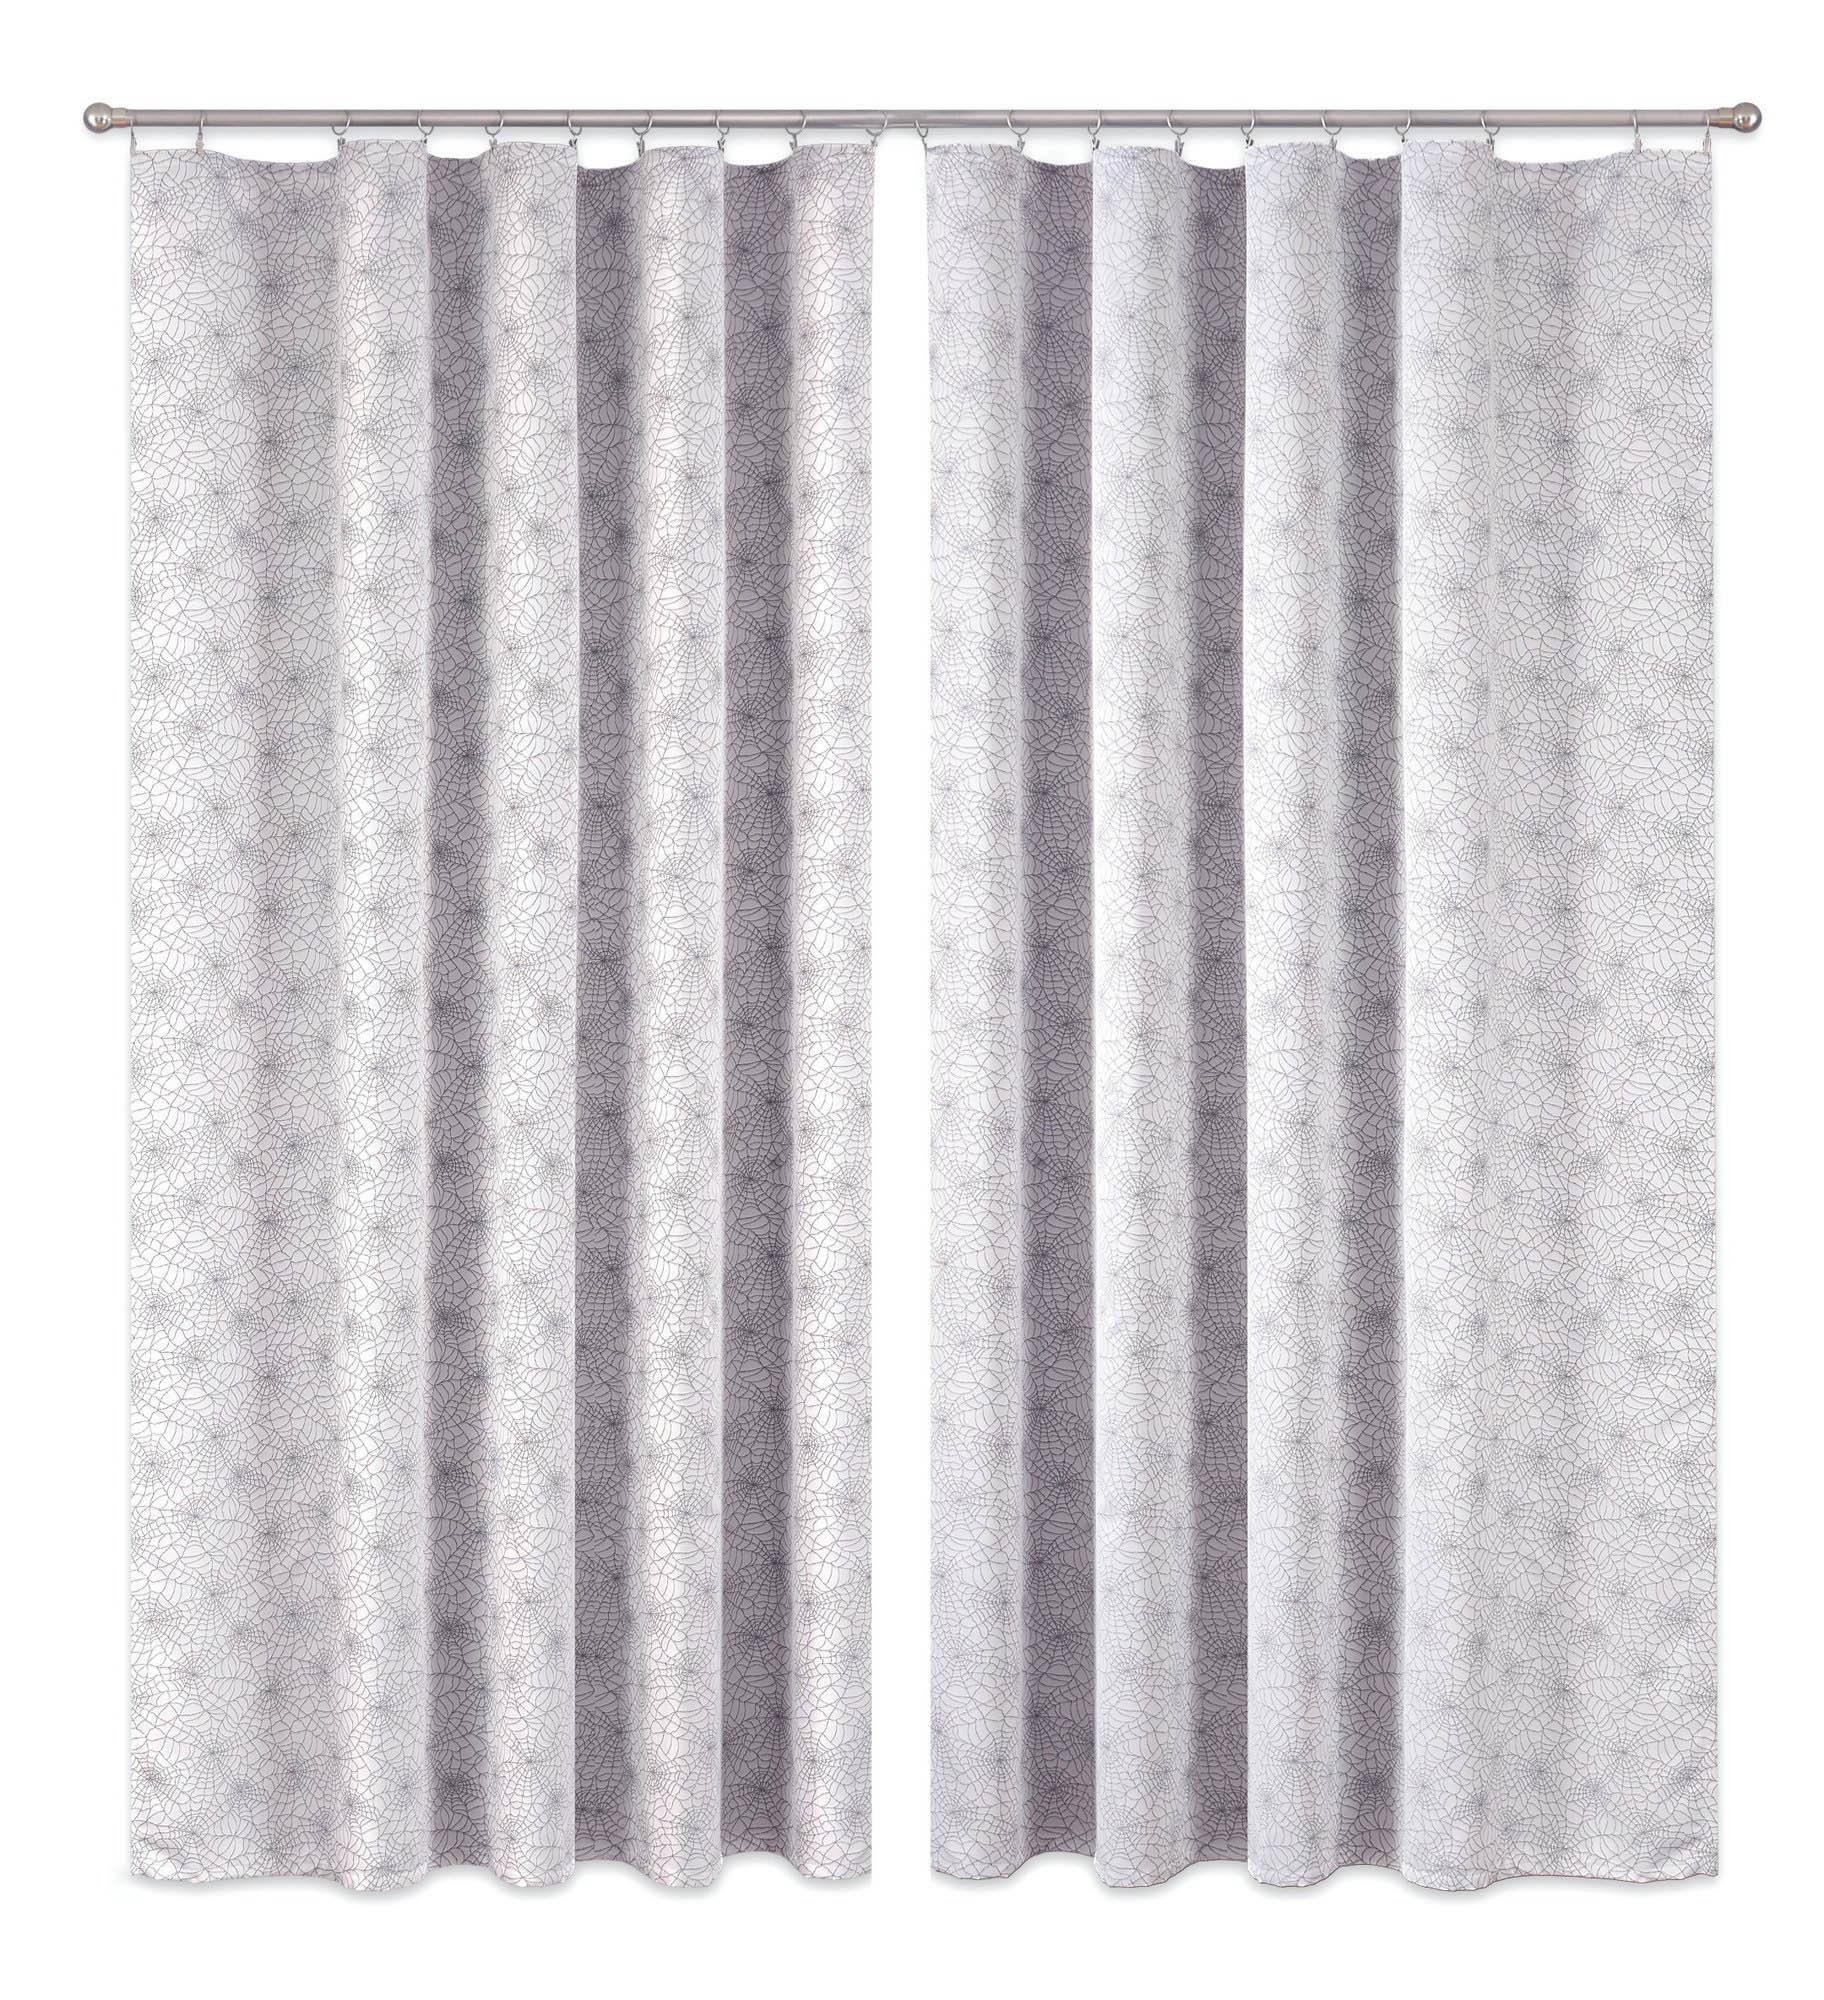 Шторы Primavera Классические шторы Debbie Цвет: Серый шторы primavera классические шторы tilly цвет серый